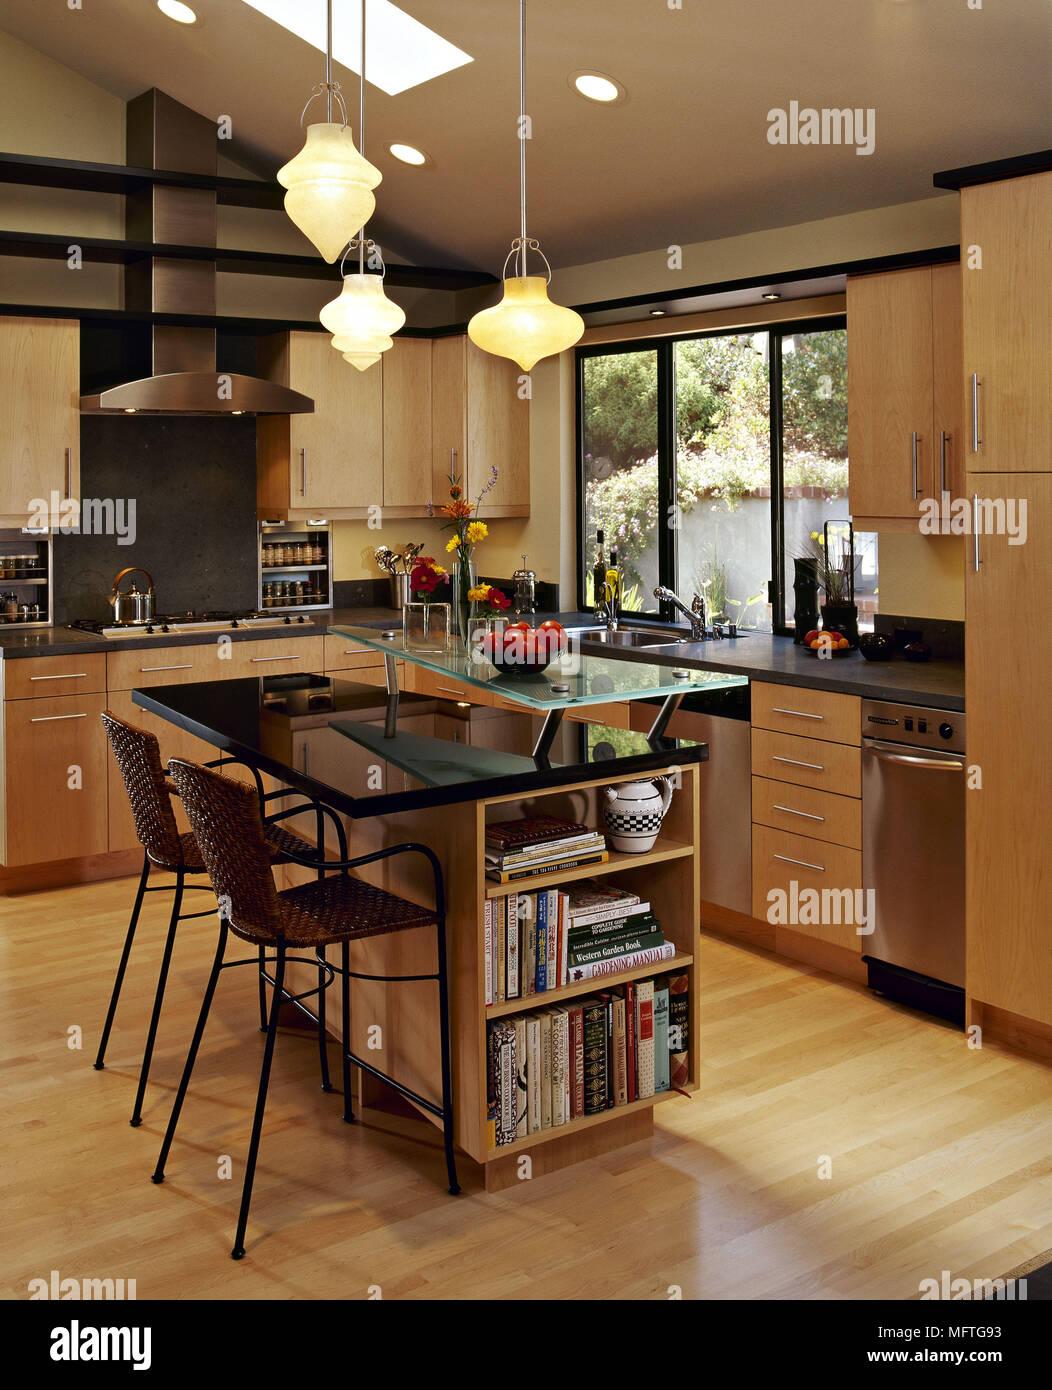 Cocina moderna de madera encimeras de granito negro for Ver cocina comedor